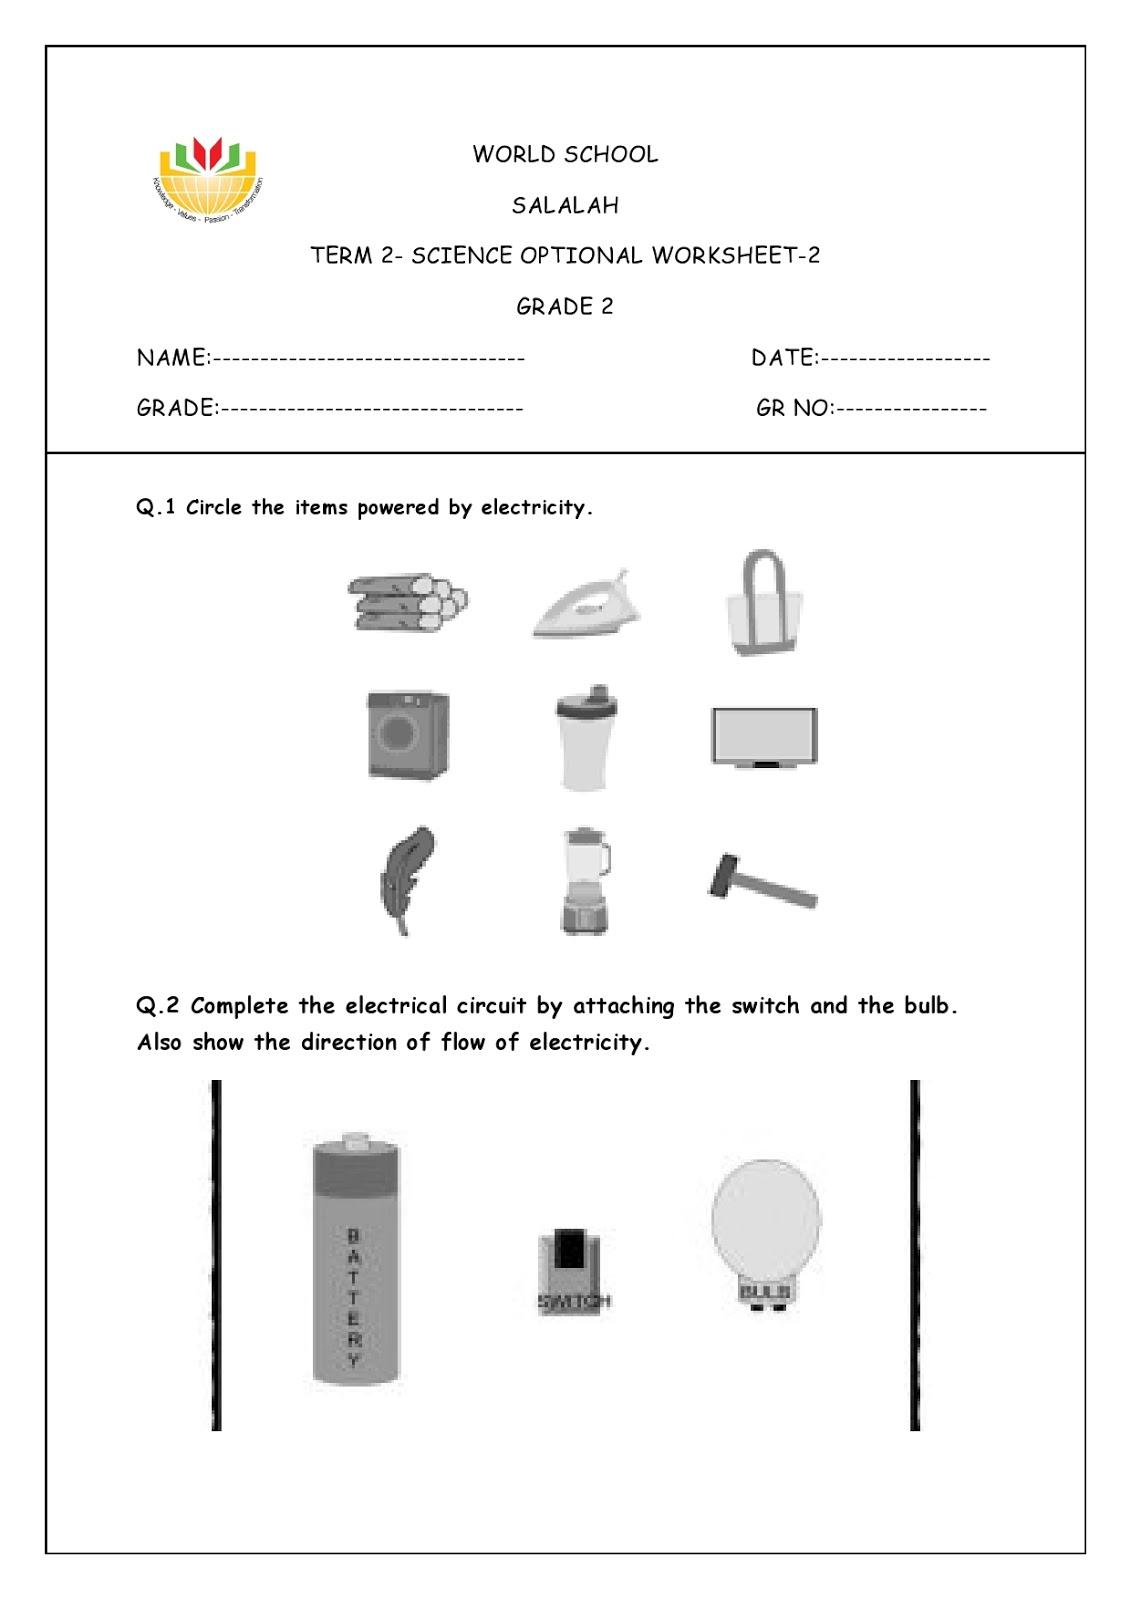 small resolution of WORLD SCHOOL OMAN: Homework for Grade 2 as on 17/03/2020